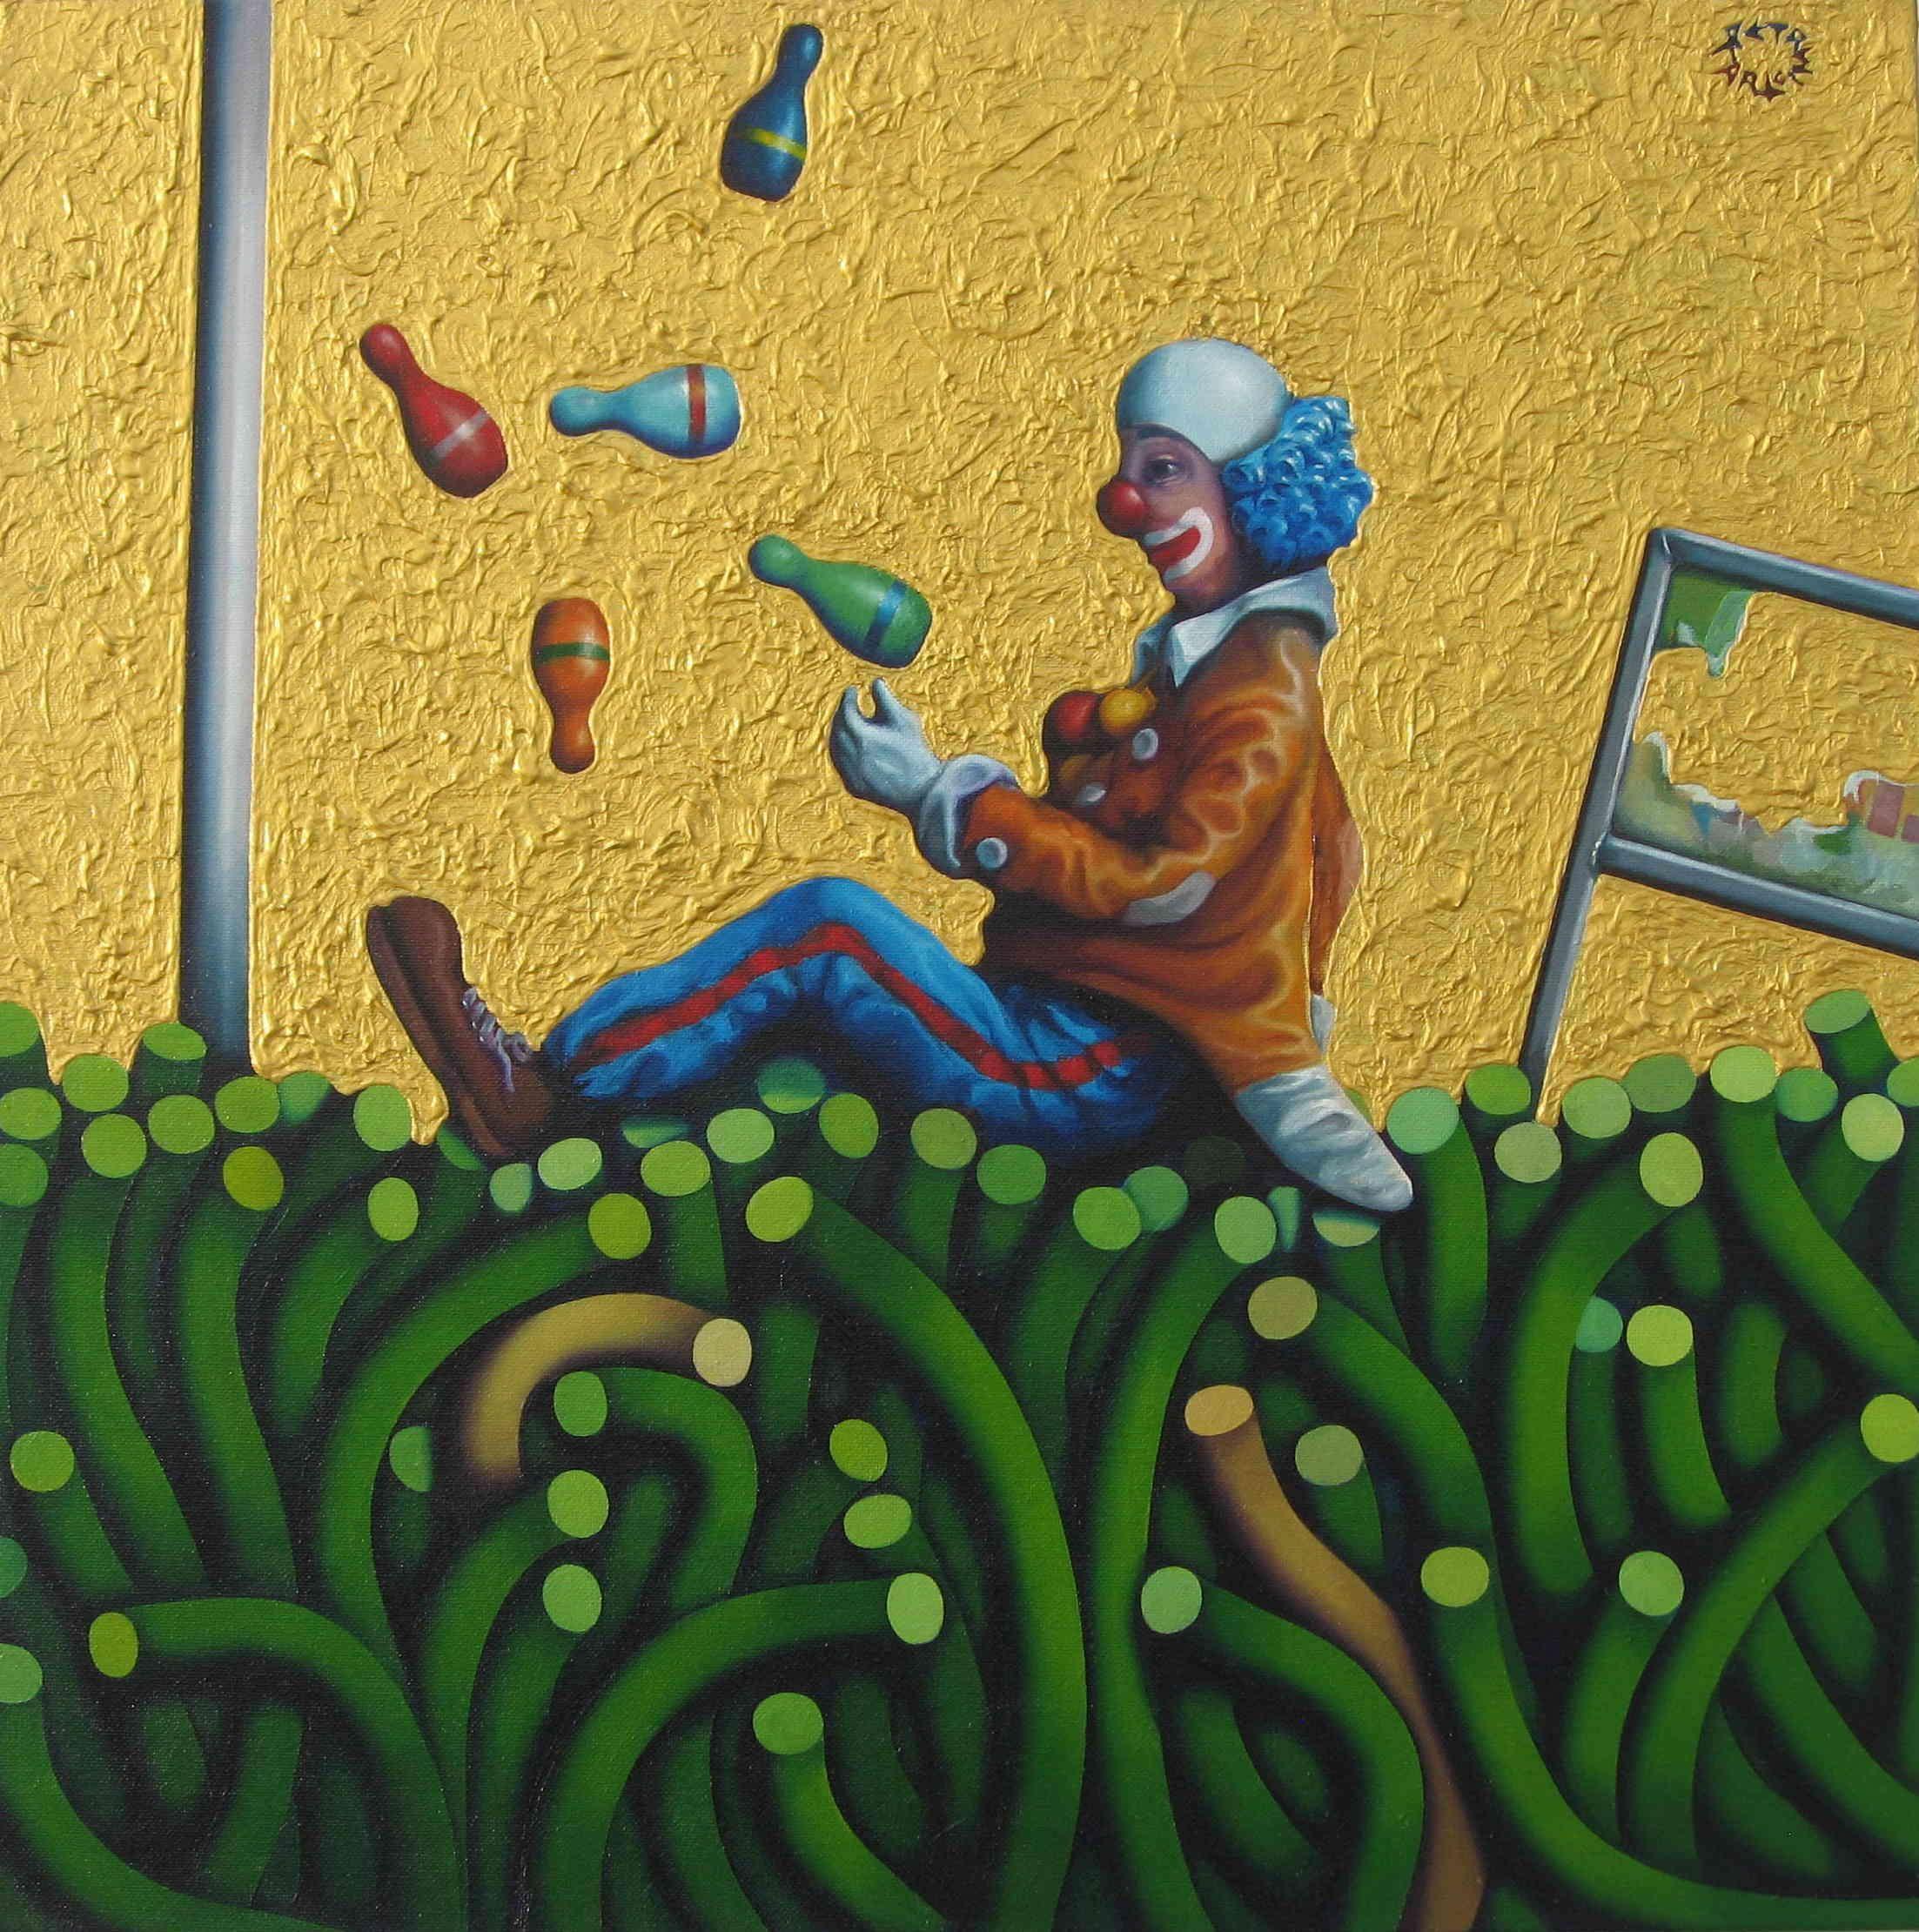 Carlo Petrini | New Original Paintings from Italy | Pinterest ...